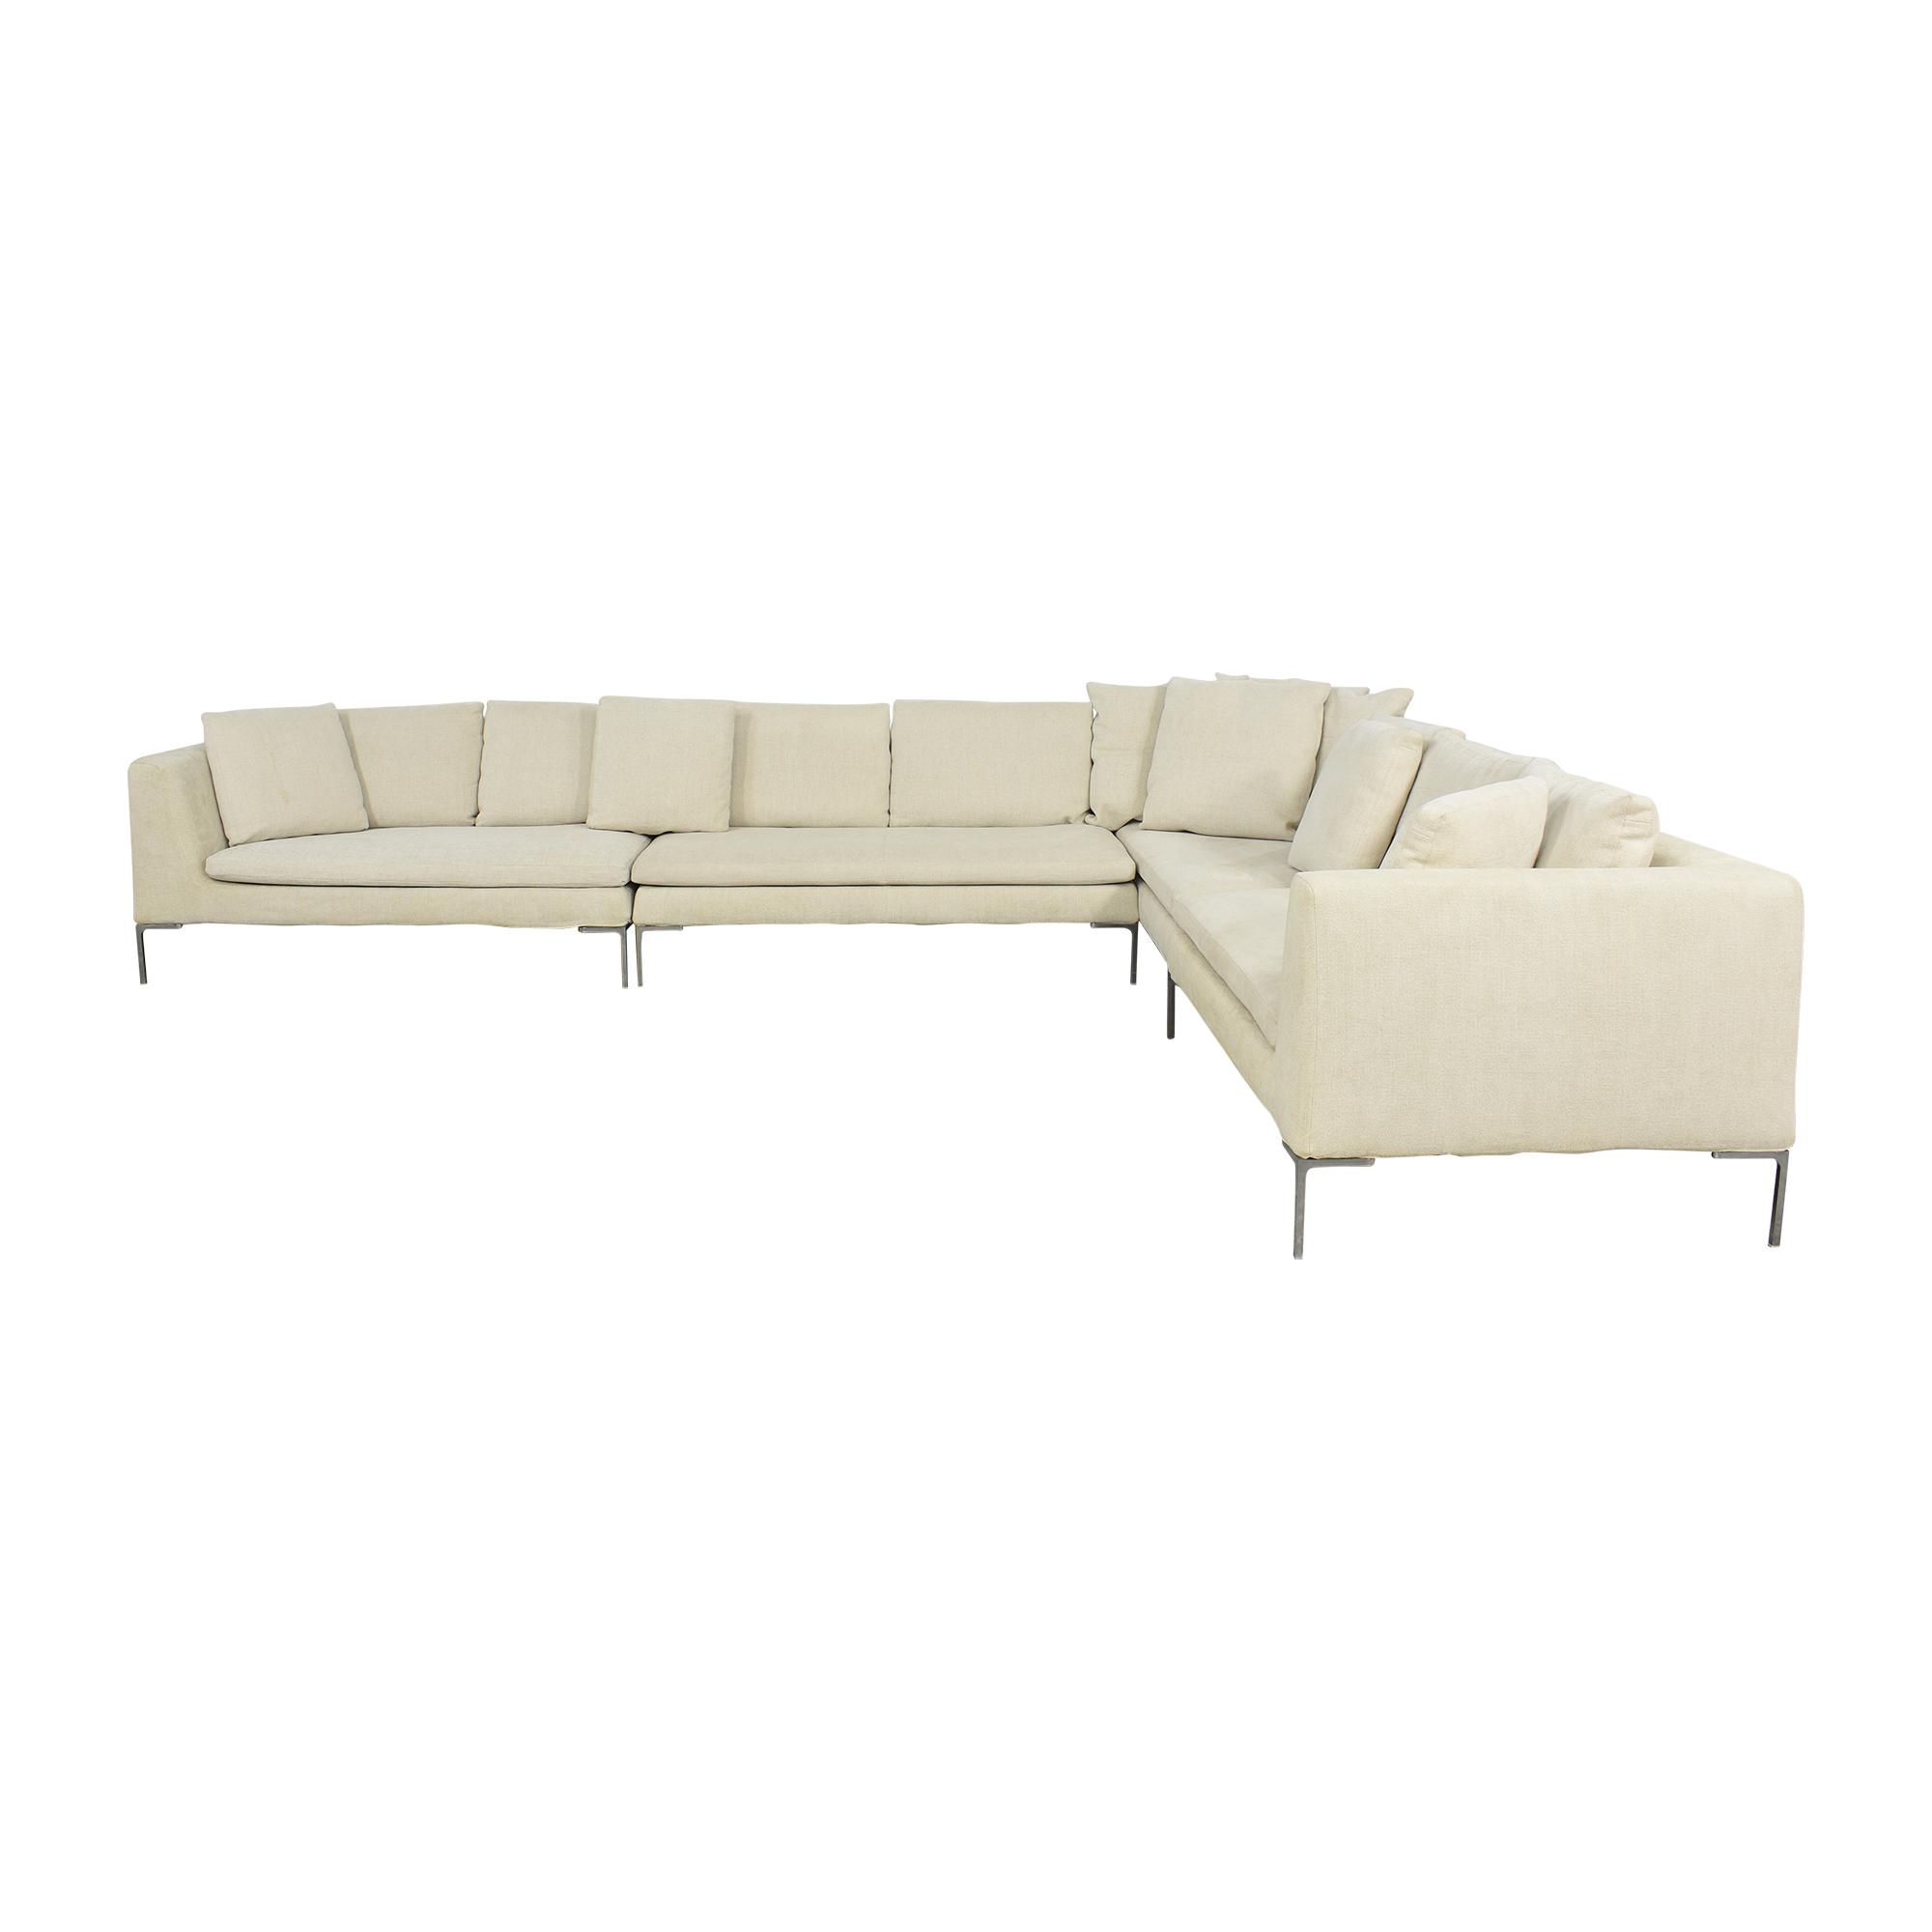 B&B Italia B&B Italia Charles Large Sectional Sofa